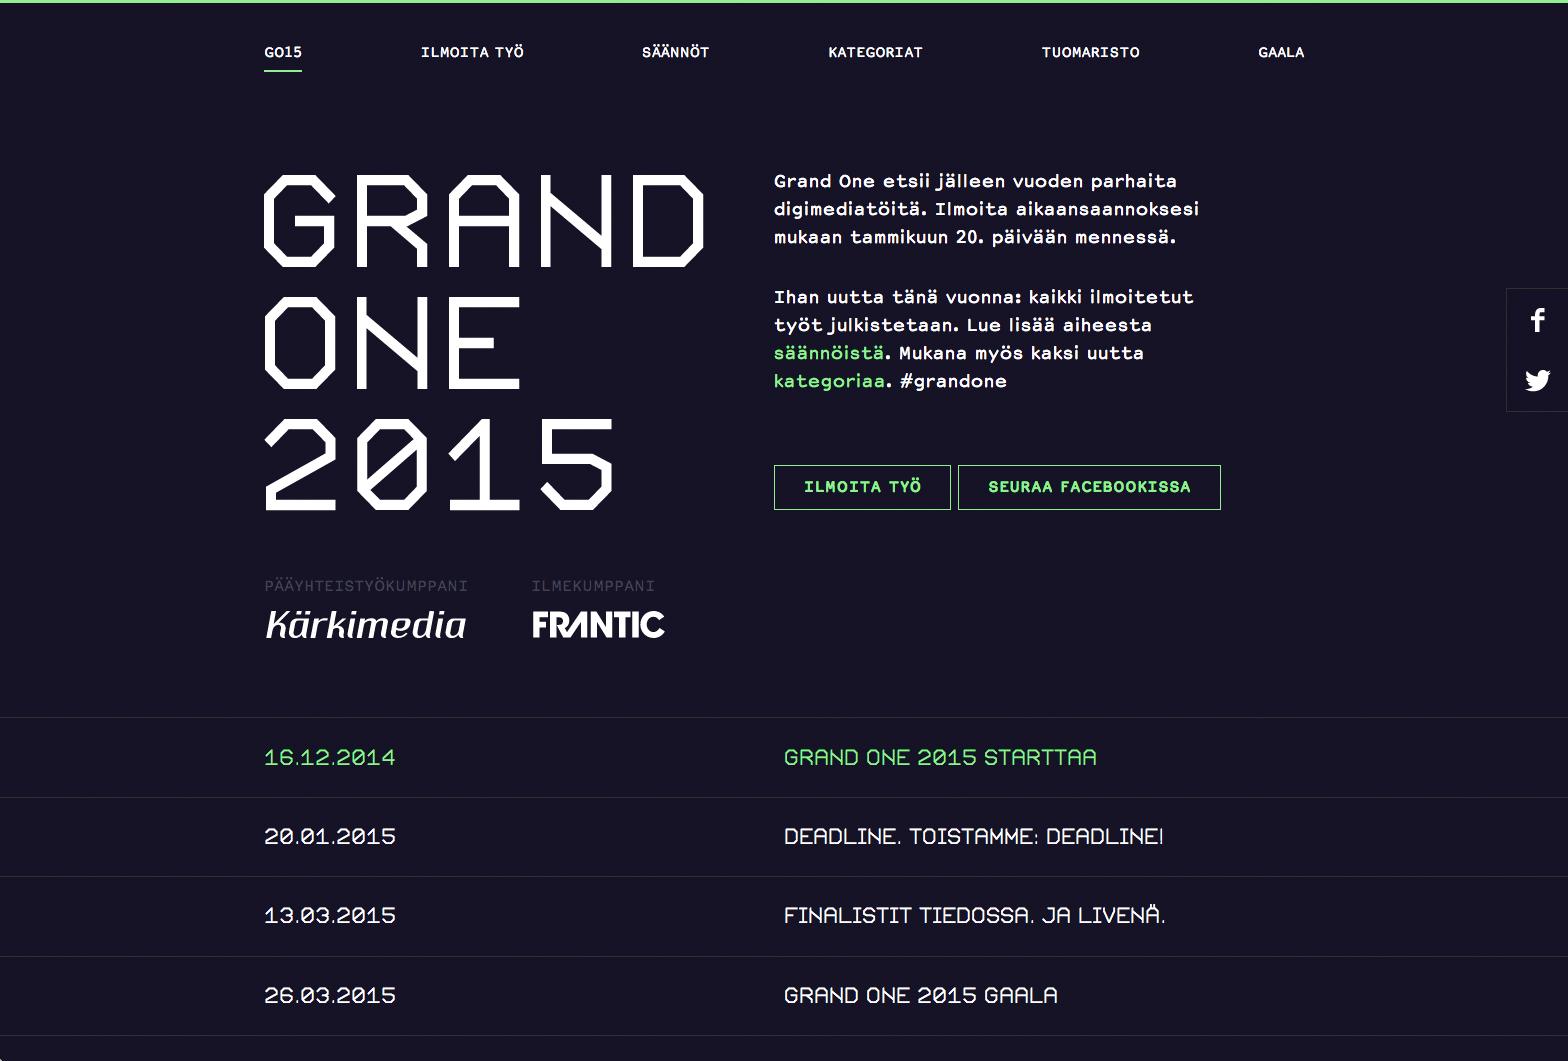 Grand One 2015